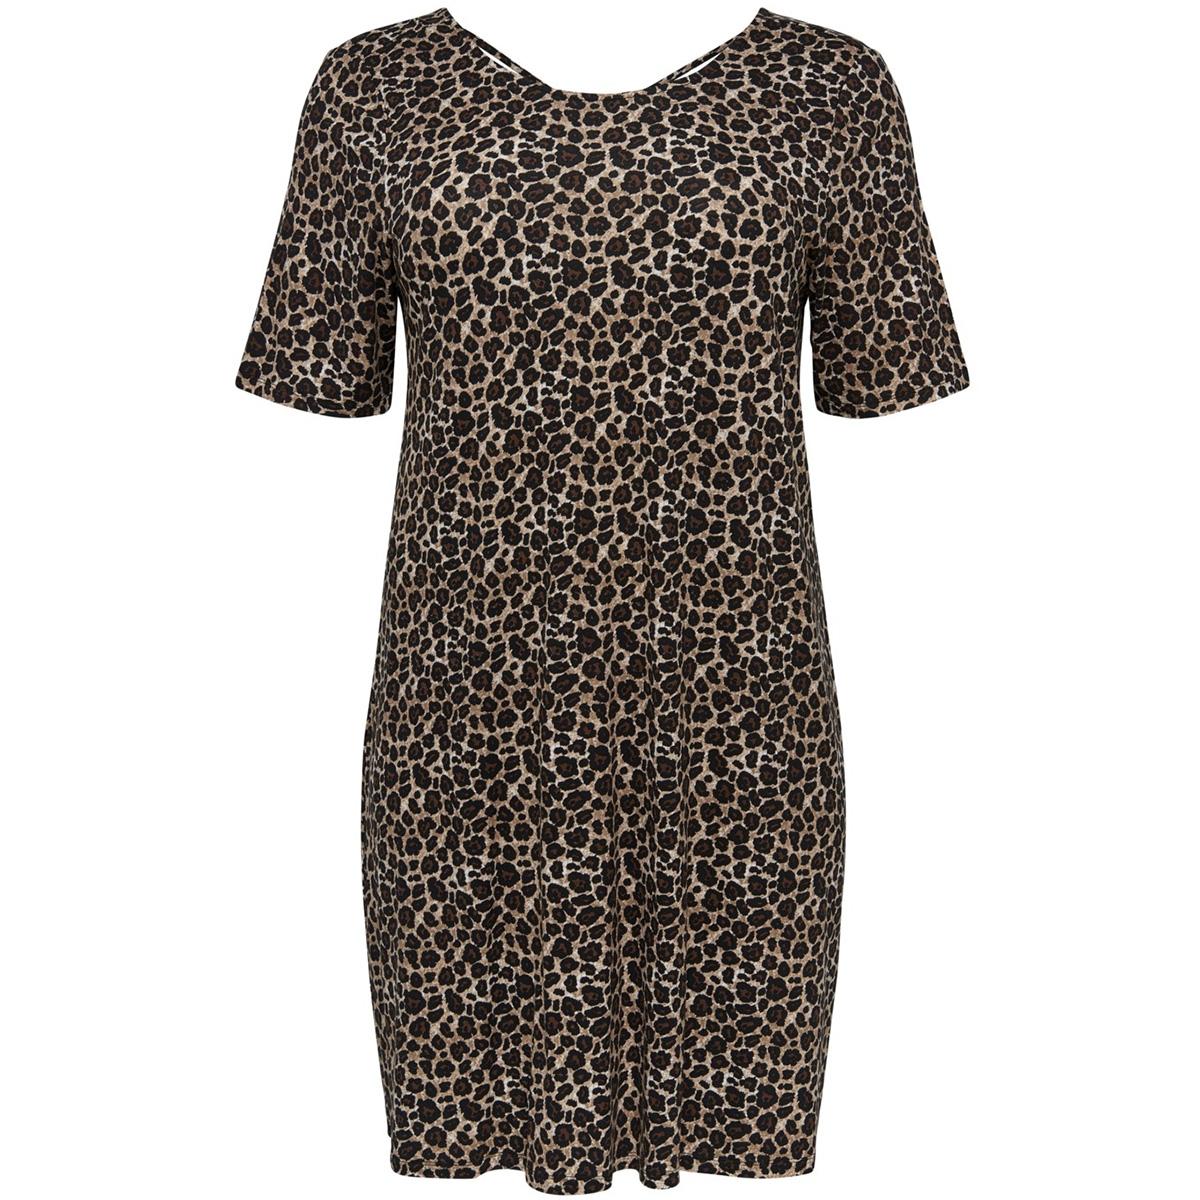 carbandana s/s dress 15161652 only carmakoma jurk black/leo